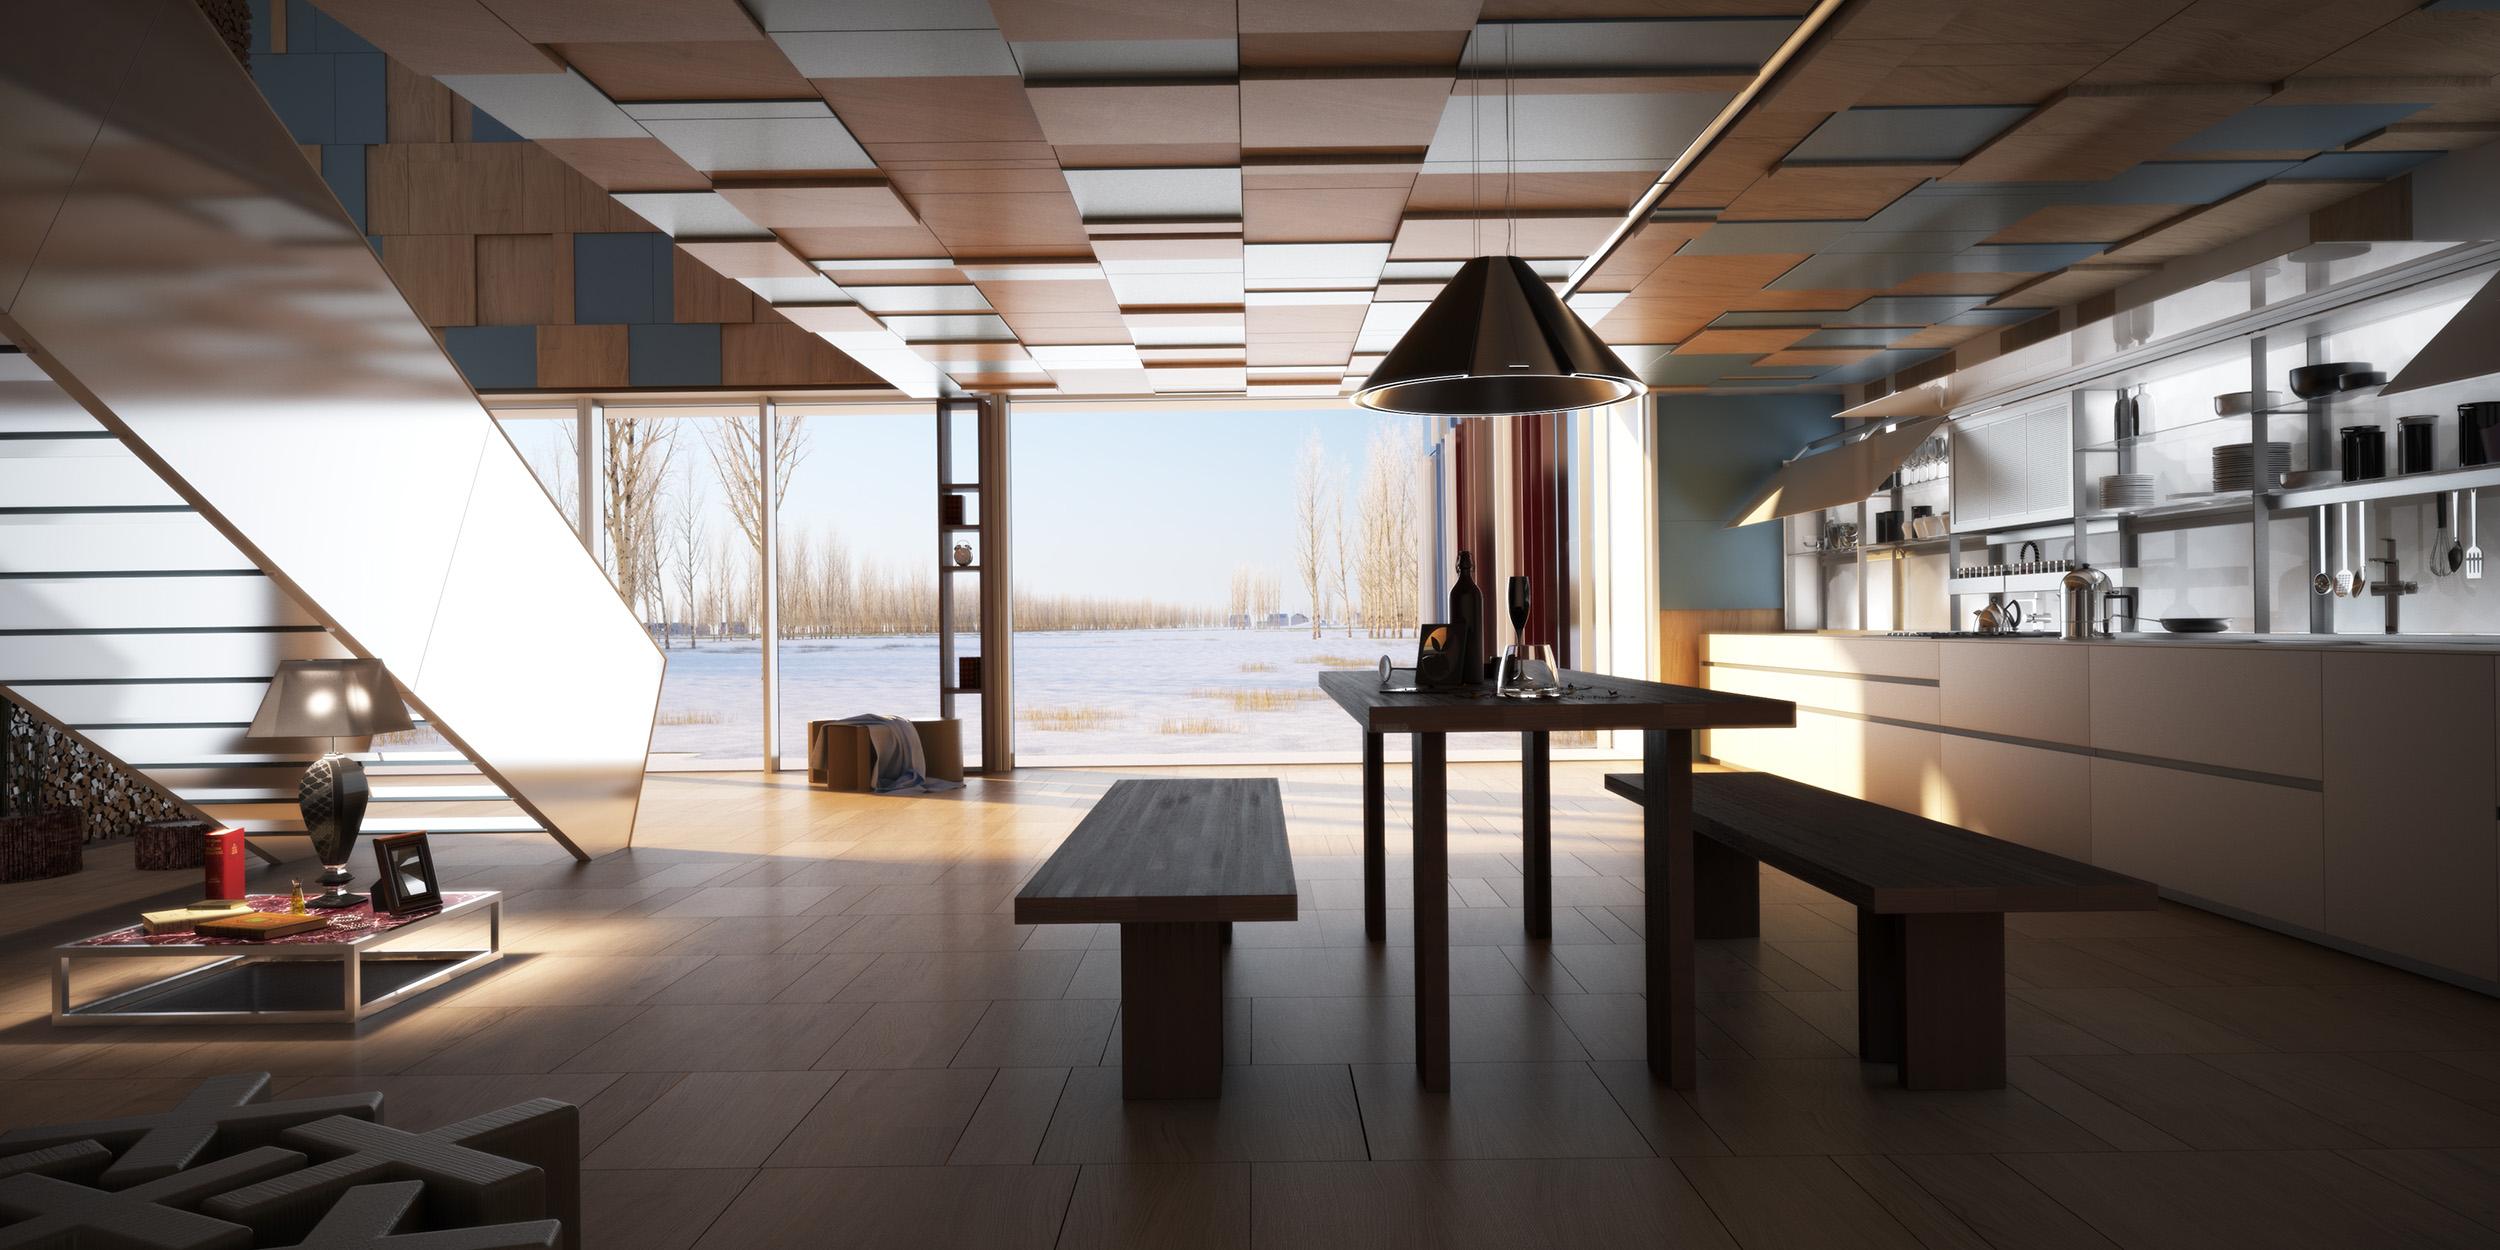 Valcucine kitchen- interior and product design